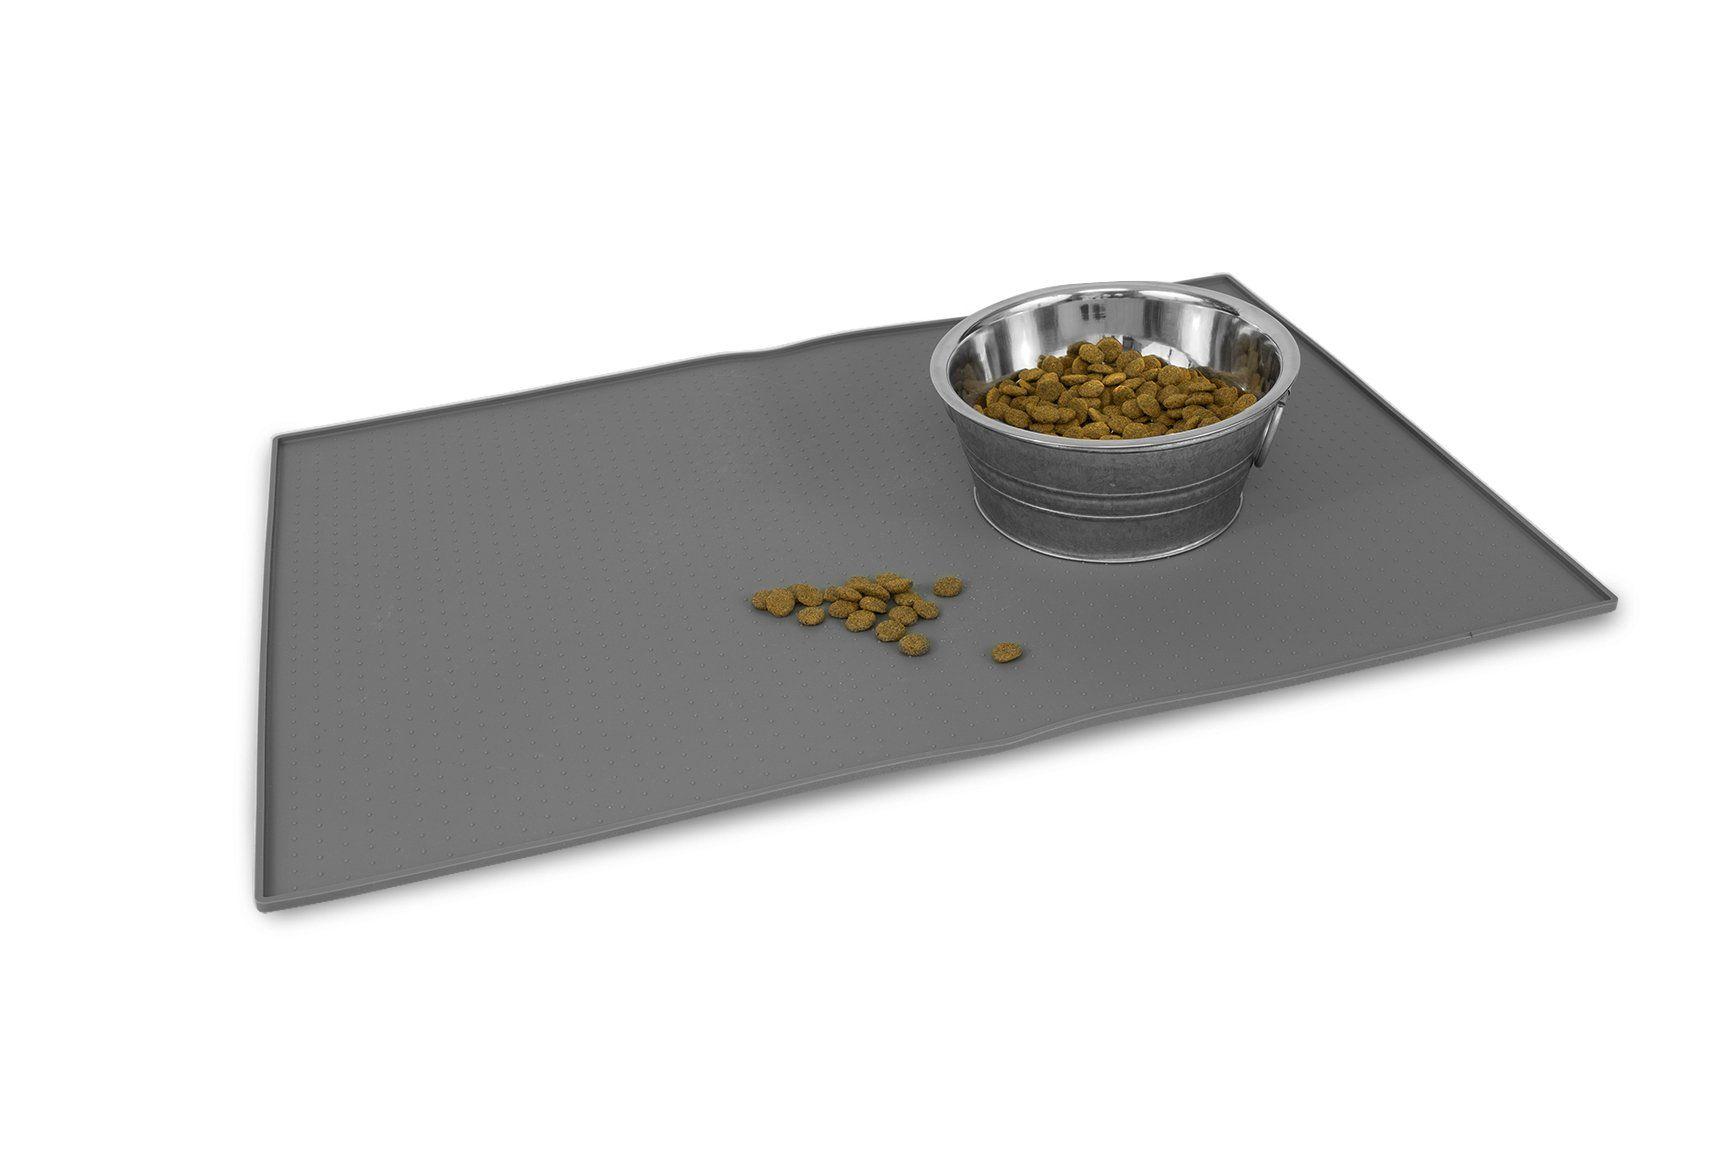 Jojos pet supplies top quality pet food mat premium fda